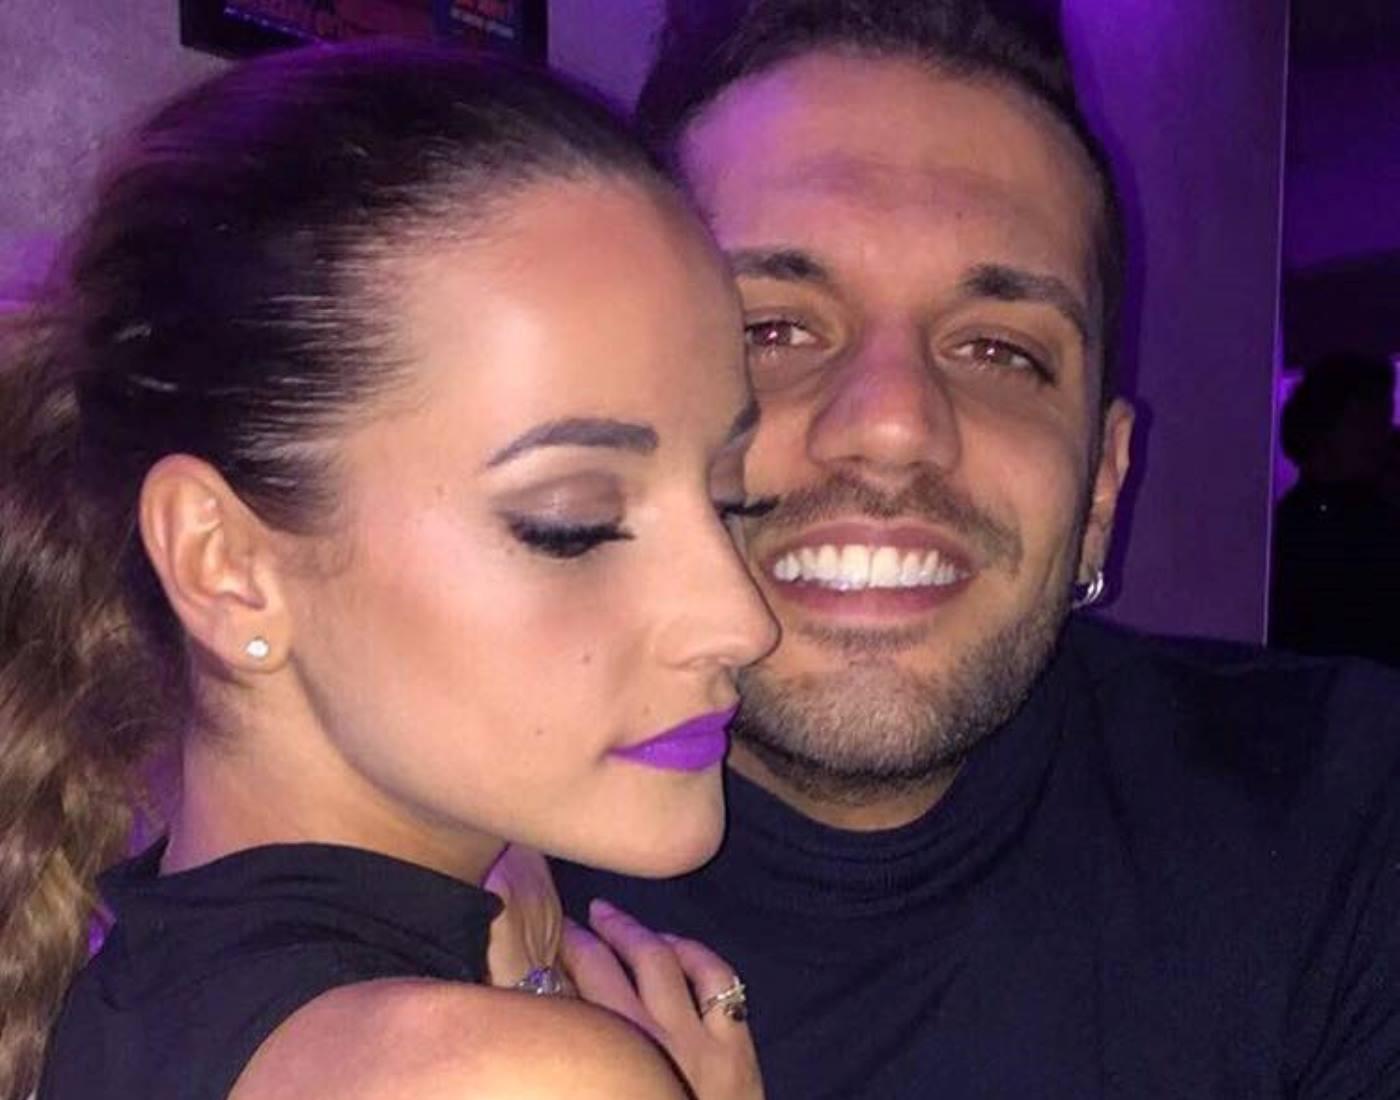 Lidia Vella dopo Alessandro Calabrese flirta con Gianmarco Valenza [FOTO]